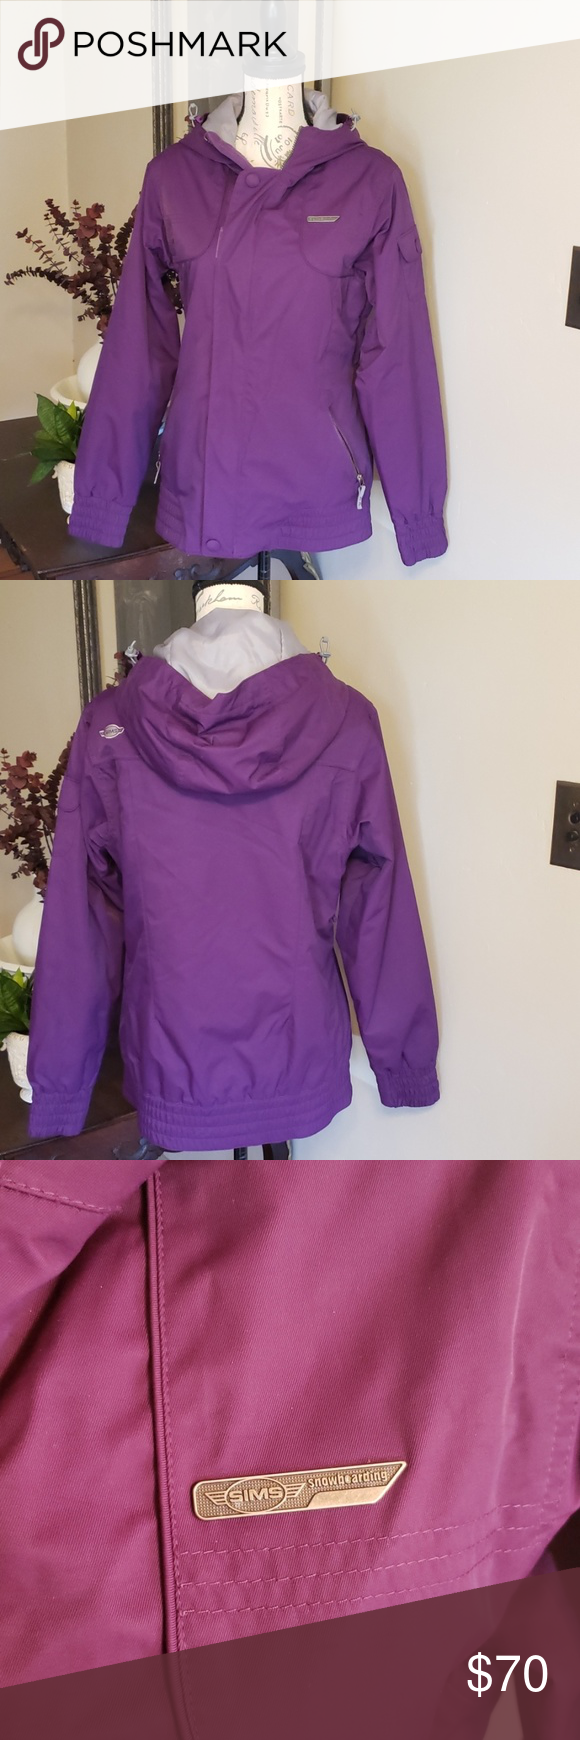 Photo of Sims purple winter snowboarding jacket Sims purple with grey interior winter jac…